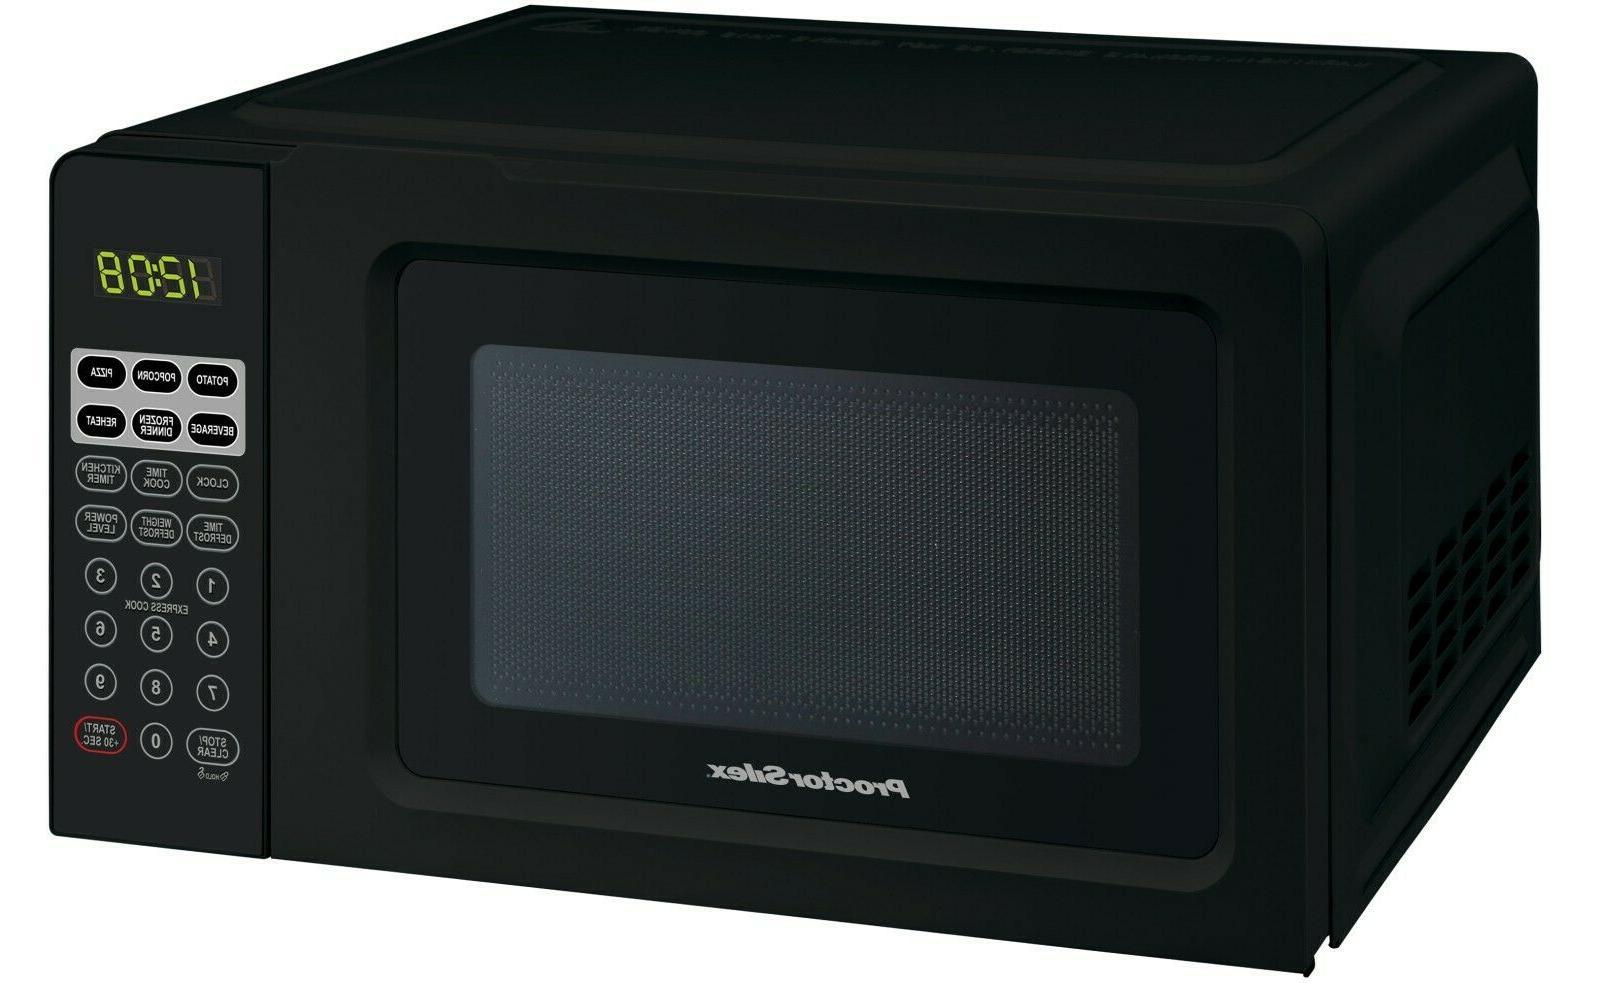 microwave oven digital compact countertop 7 cu ft best value proctor silex major appliances home garden